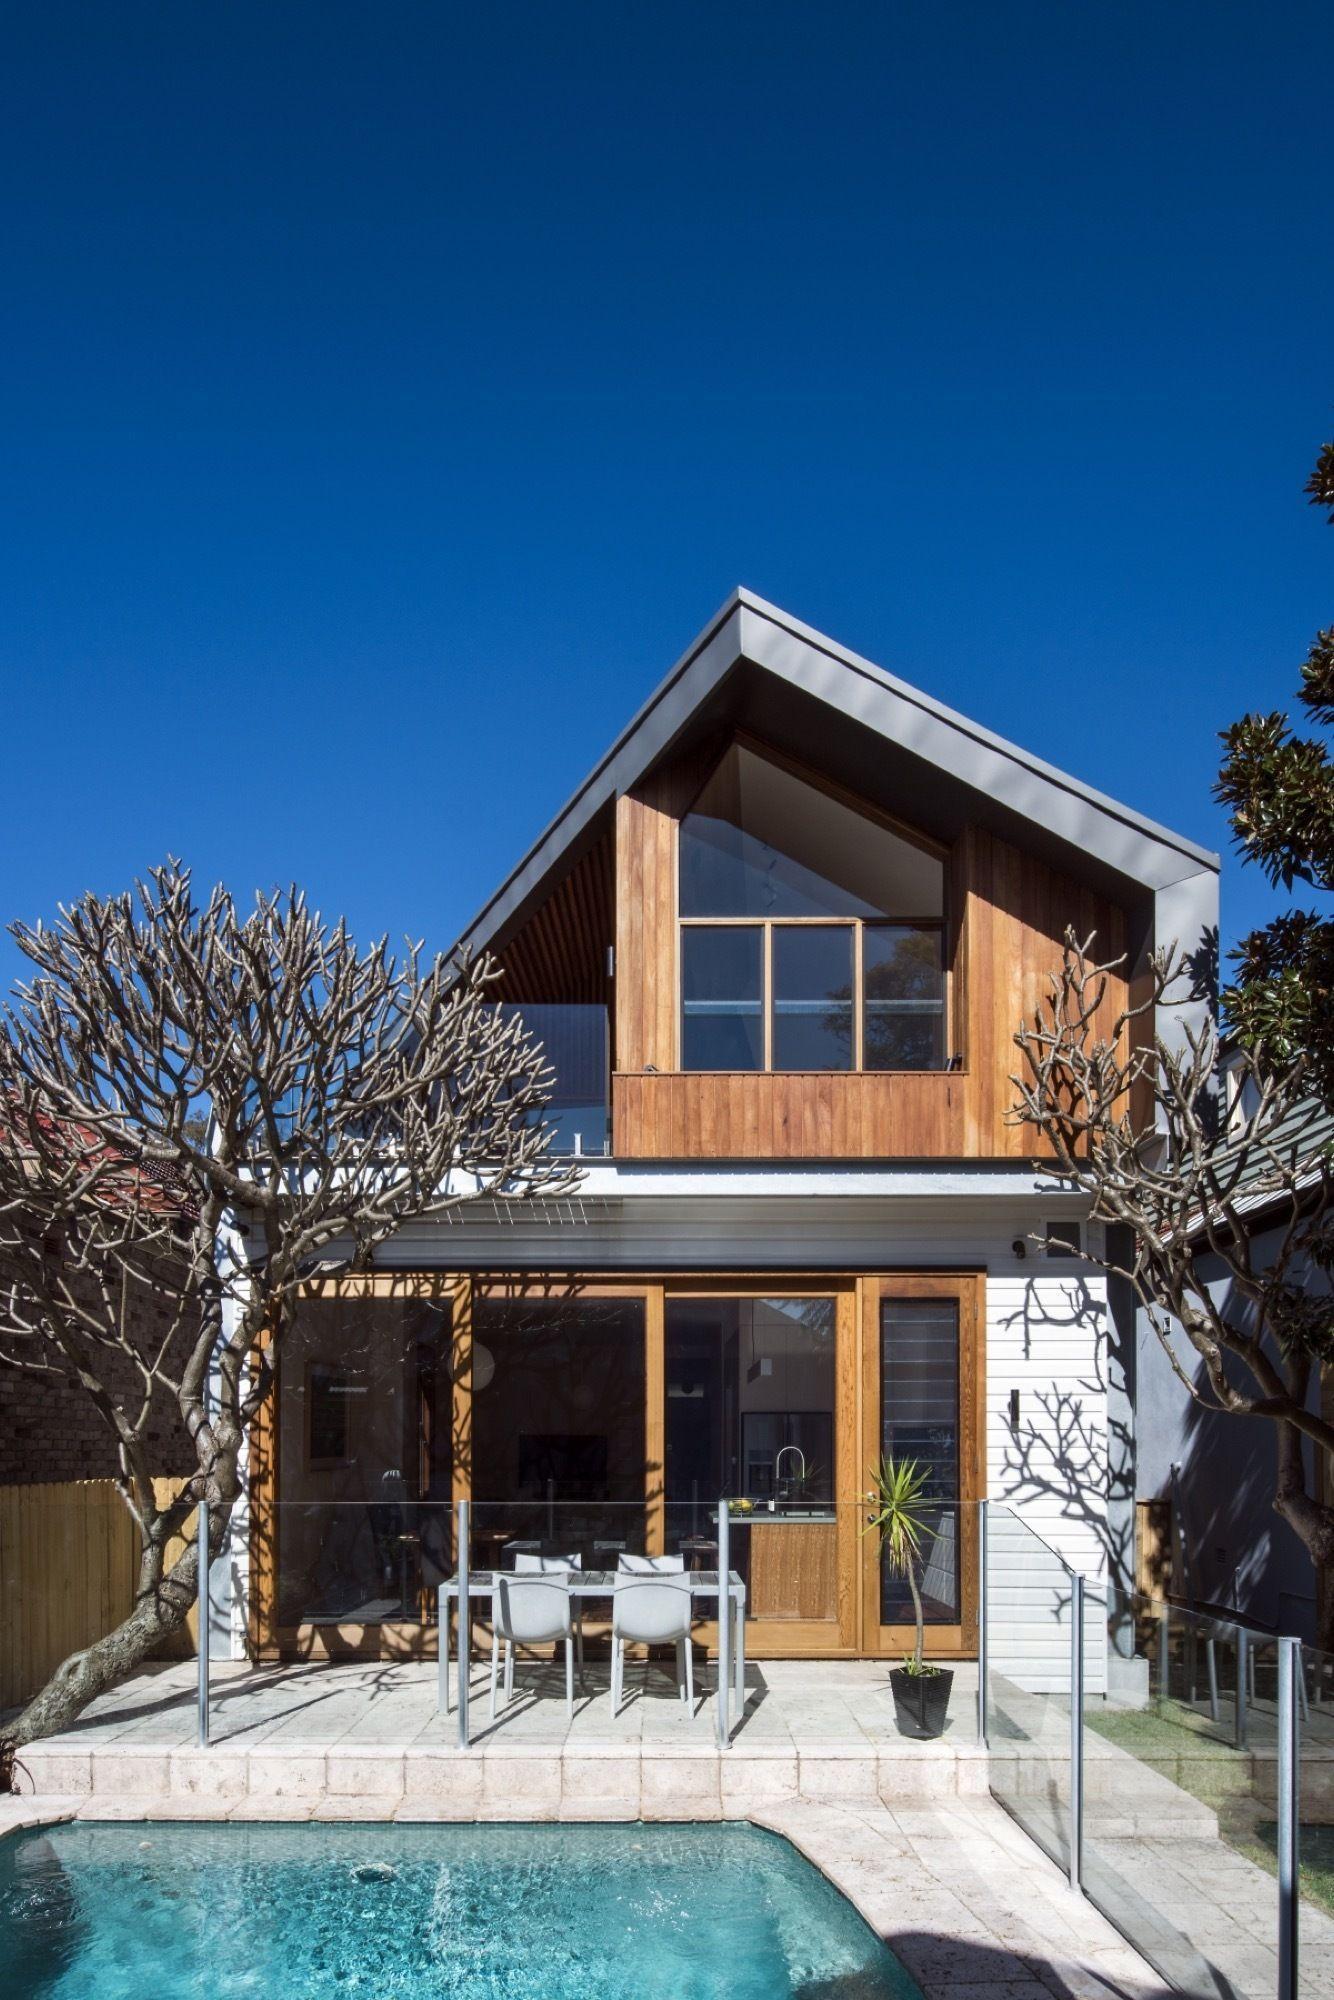 Power lane house chordstudio fachadas modernas pinterest house